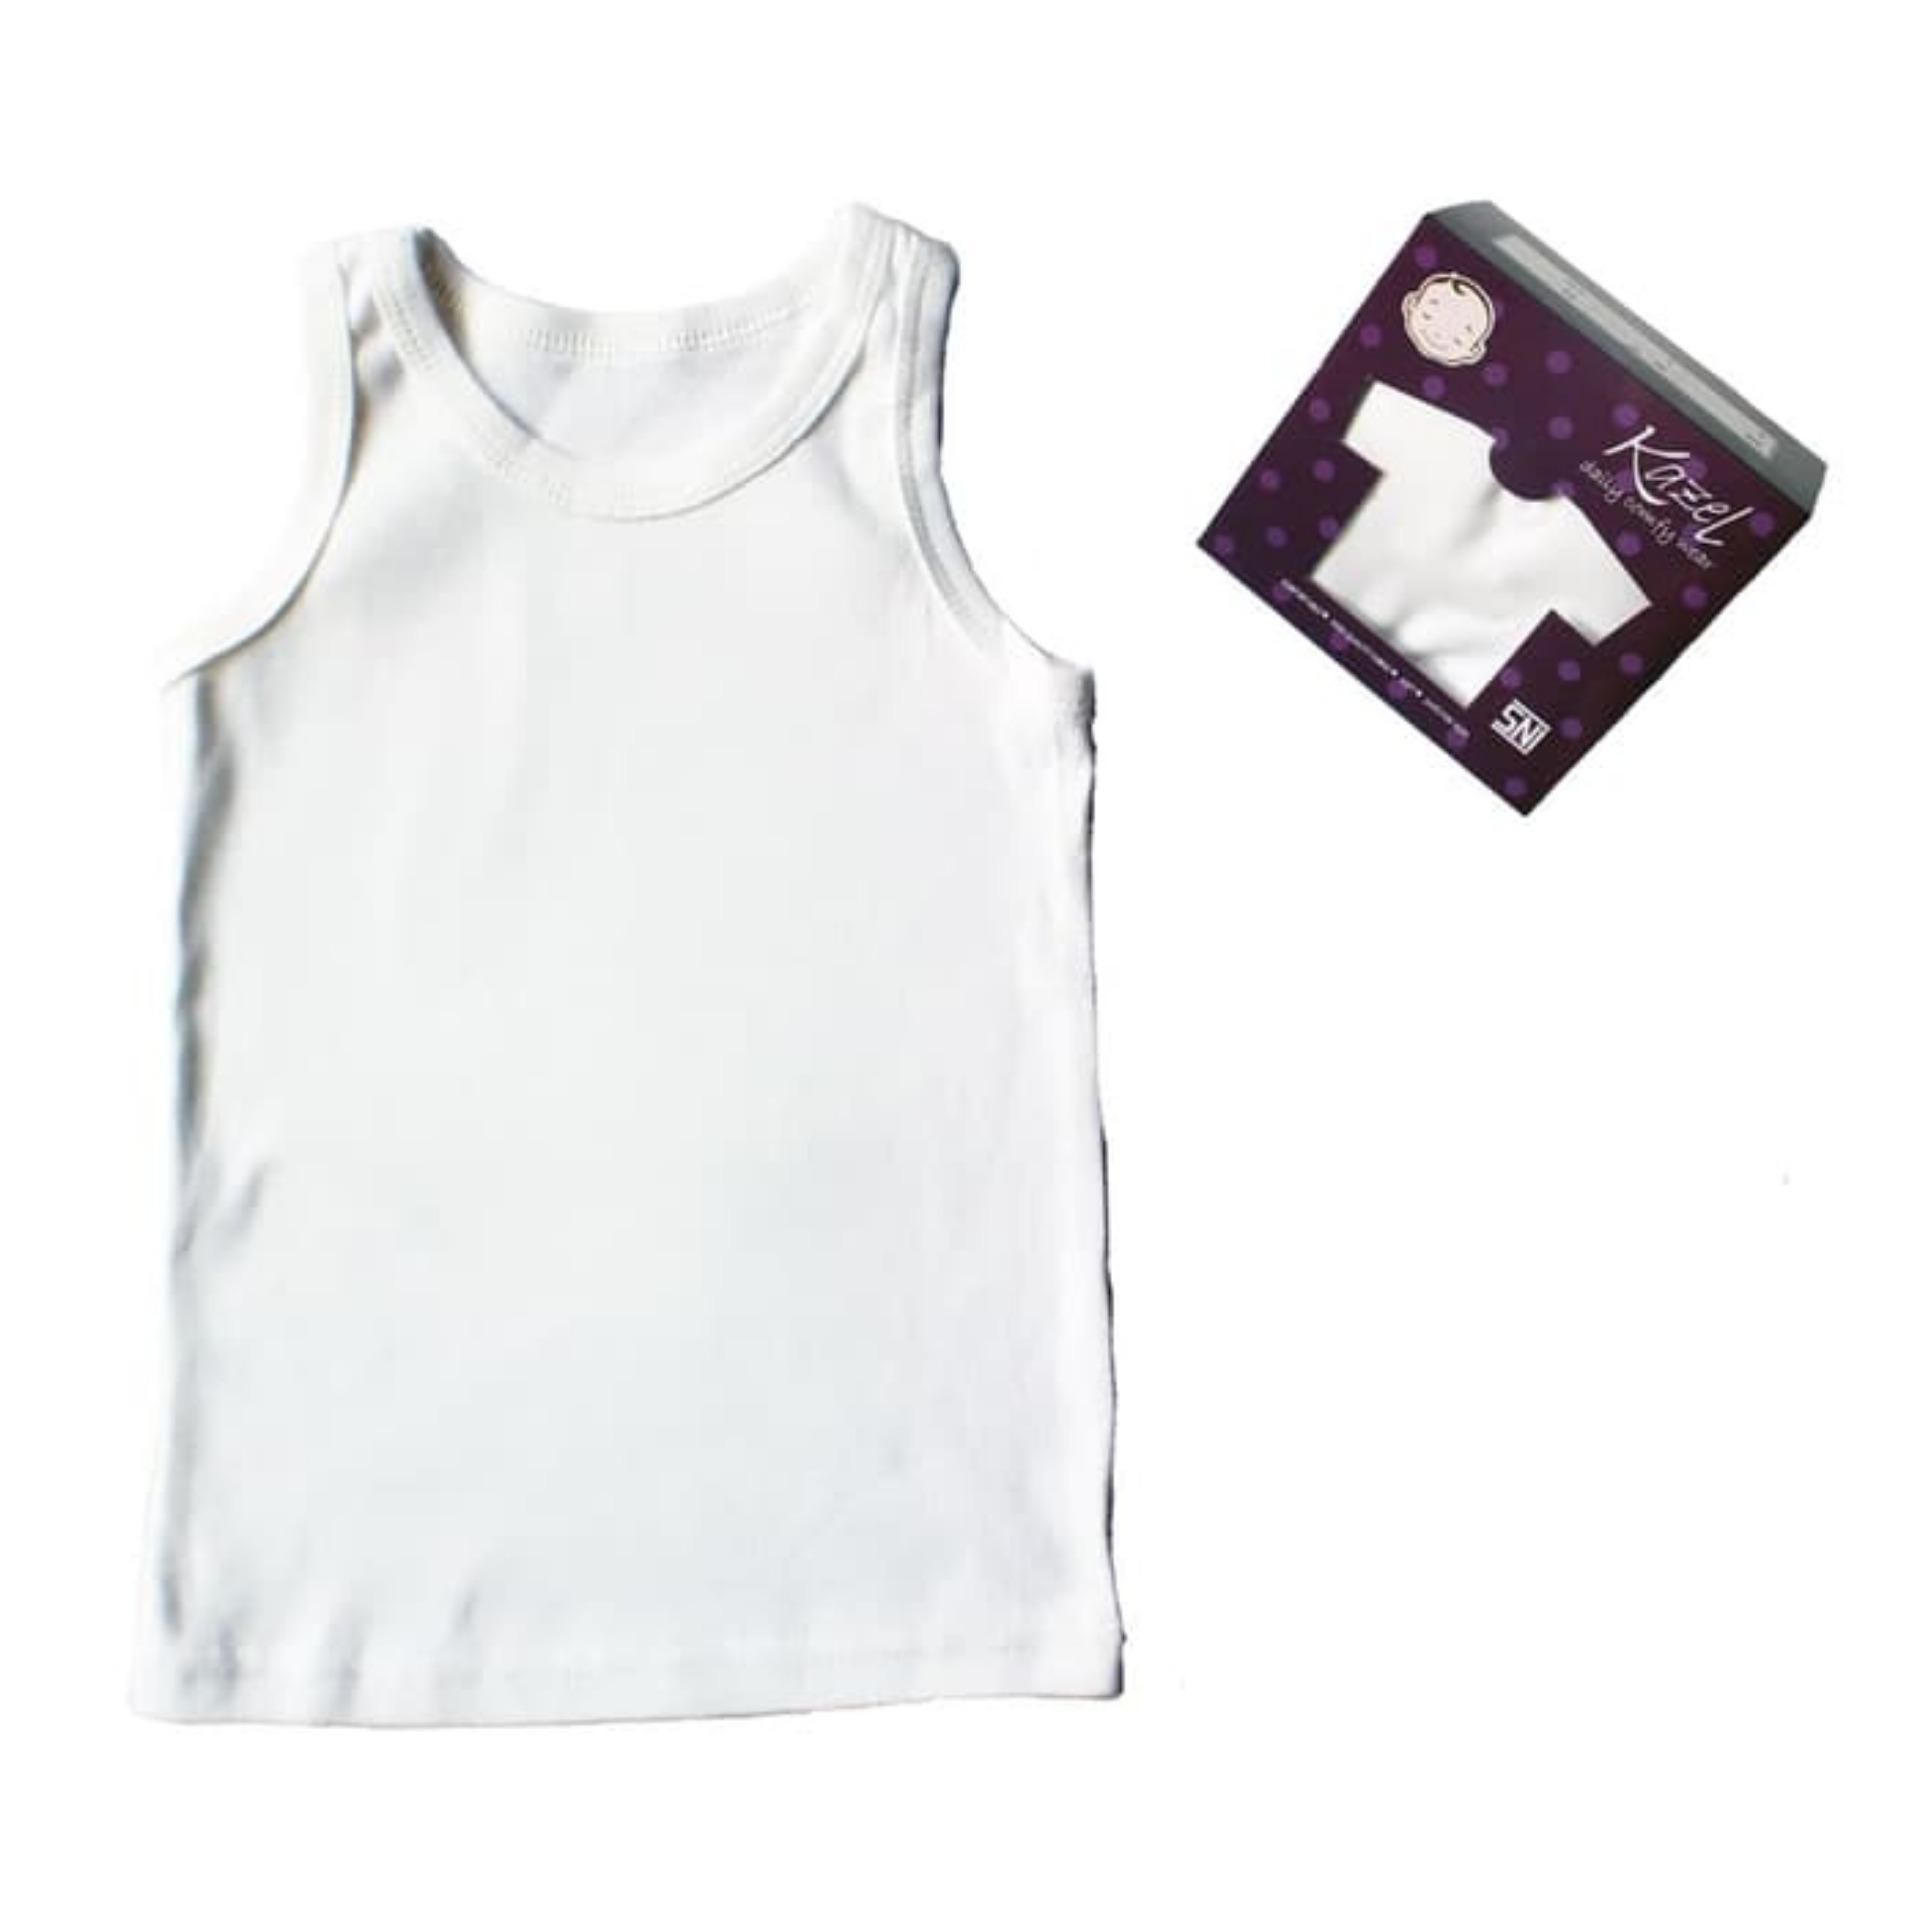 Atasan Kaus Bayi Laki Terbaik Kazel Singlet Jumper 6pcs New 9 12 Bulan Polos Putih 6in1 Size L